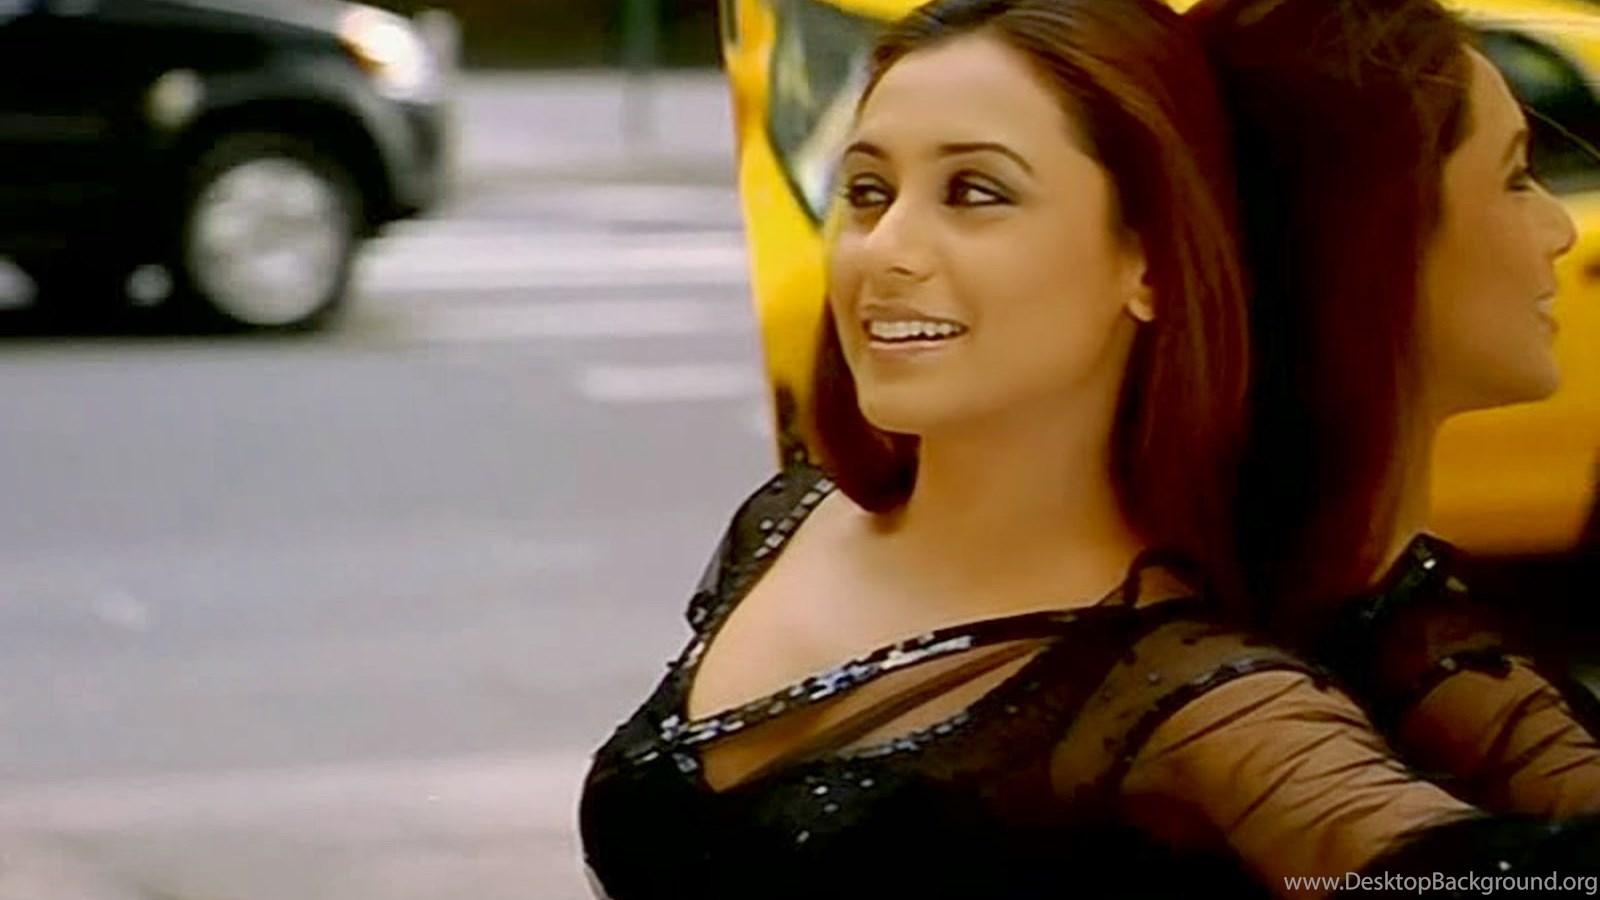 hd wallpapers of indian celebrity rani mukharji desktop background